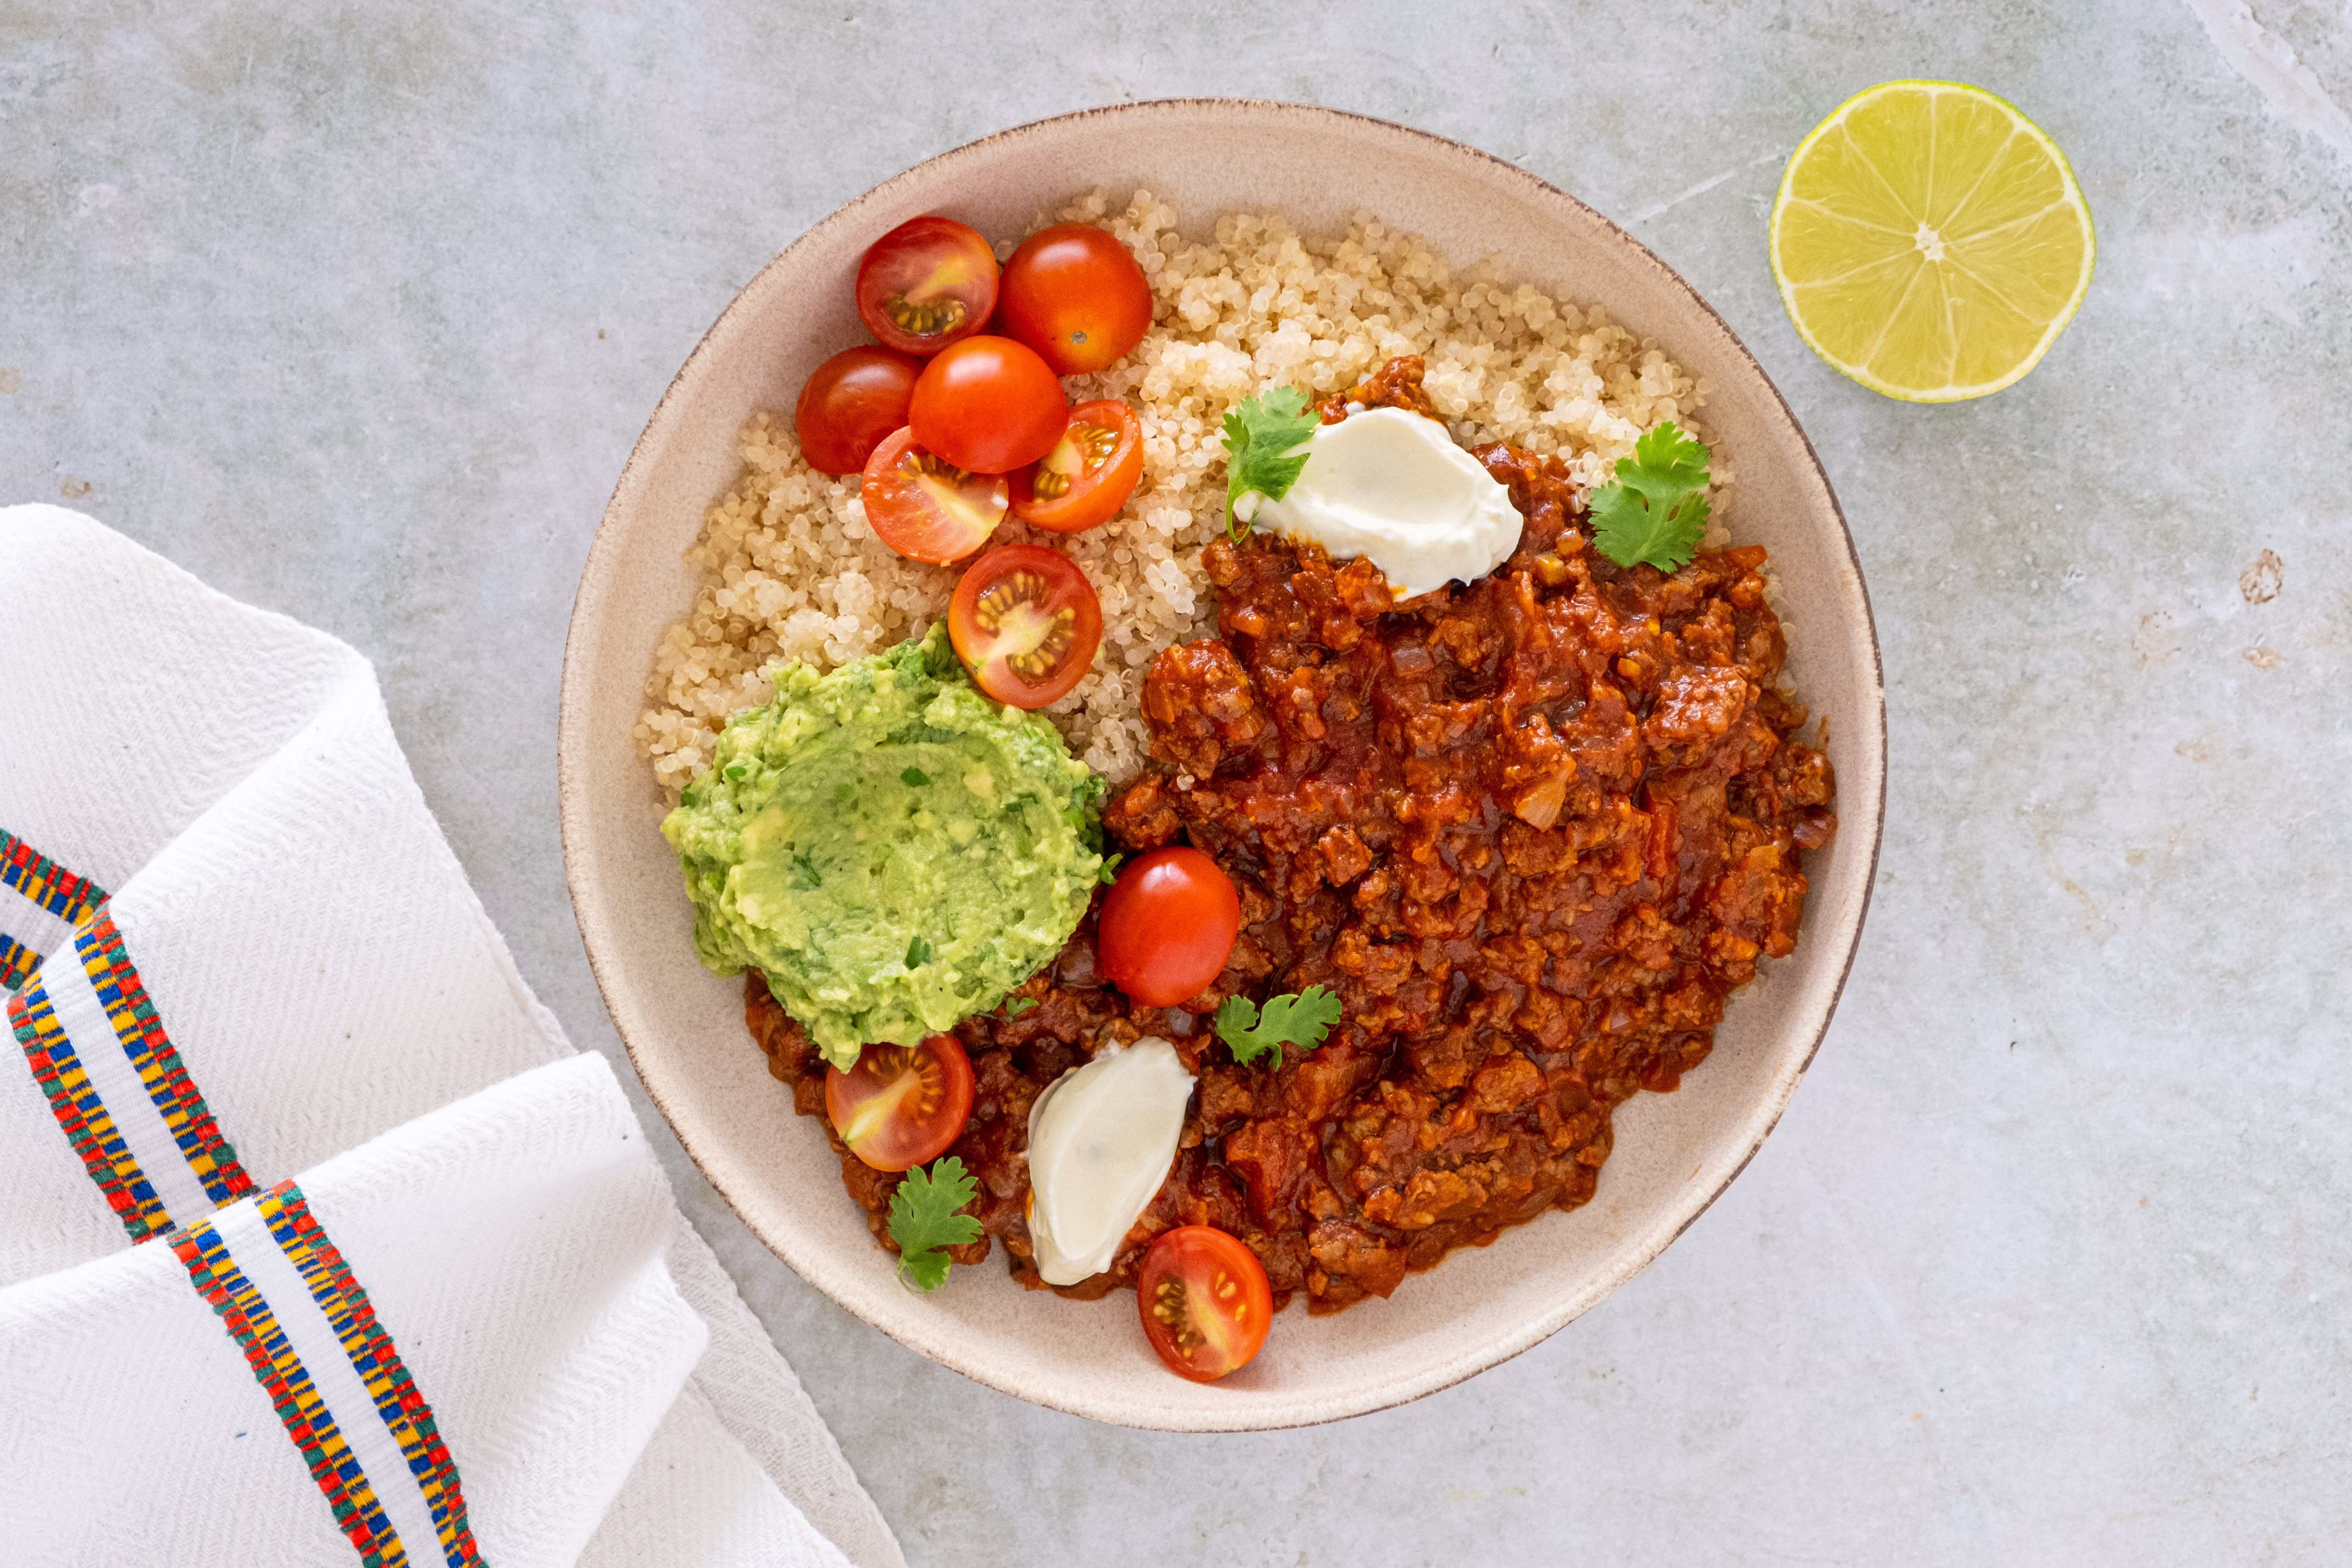 Chipotle Beef and Guacamole Quinoa Bowls